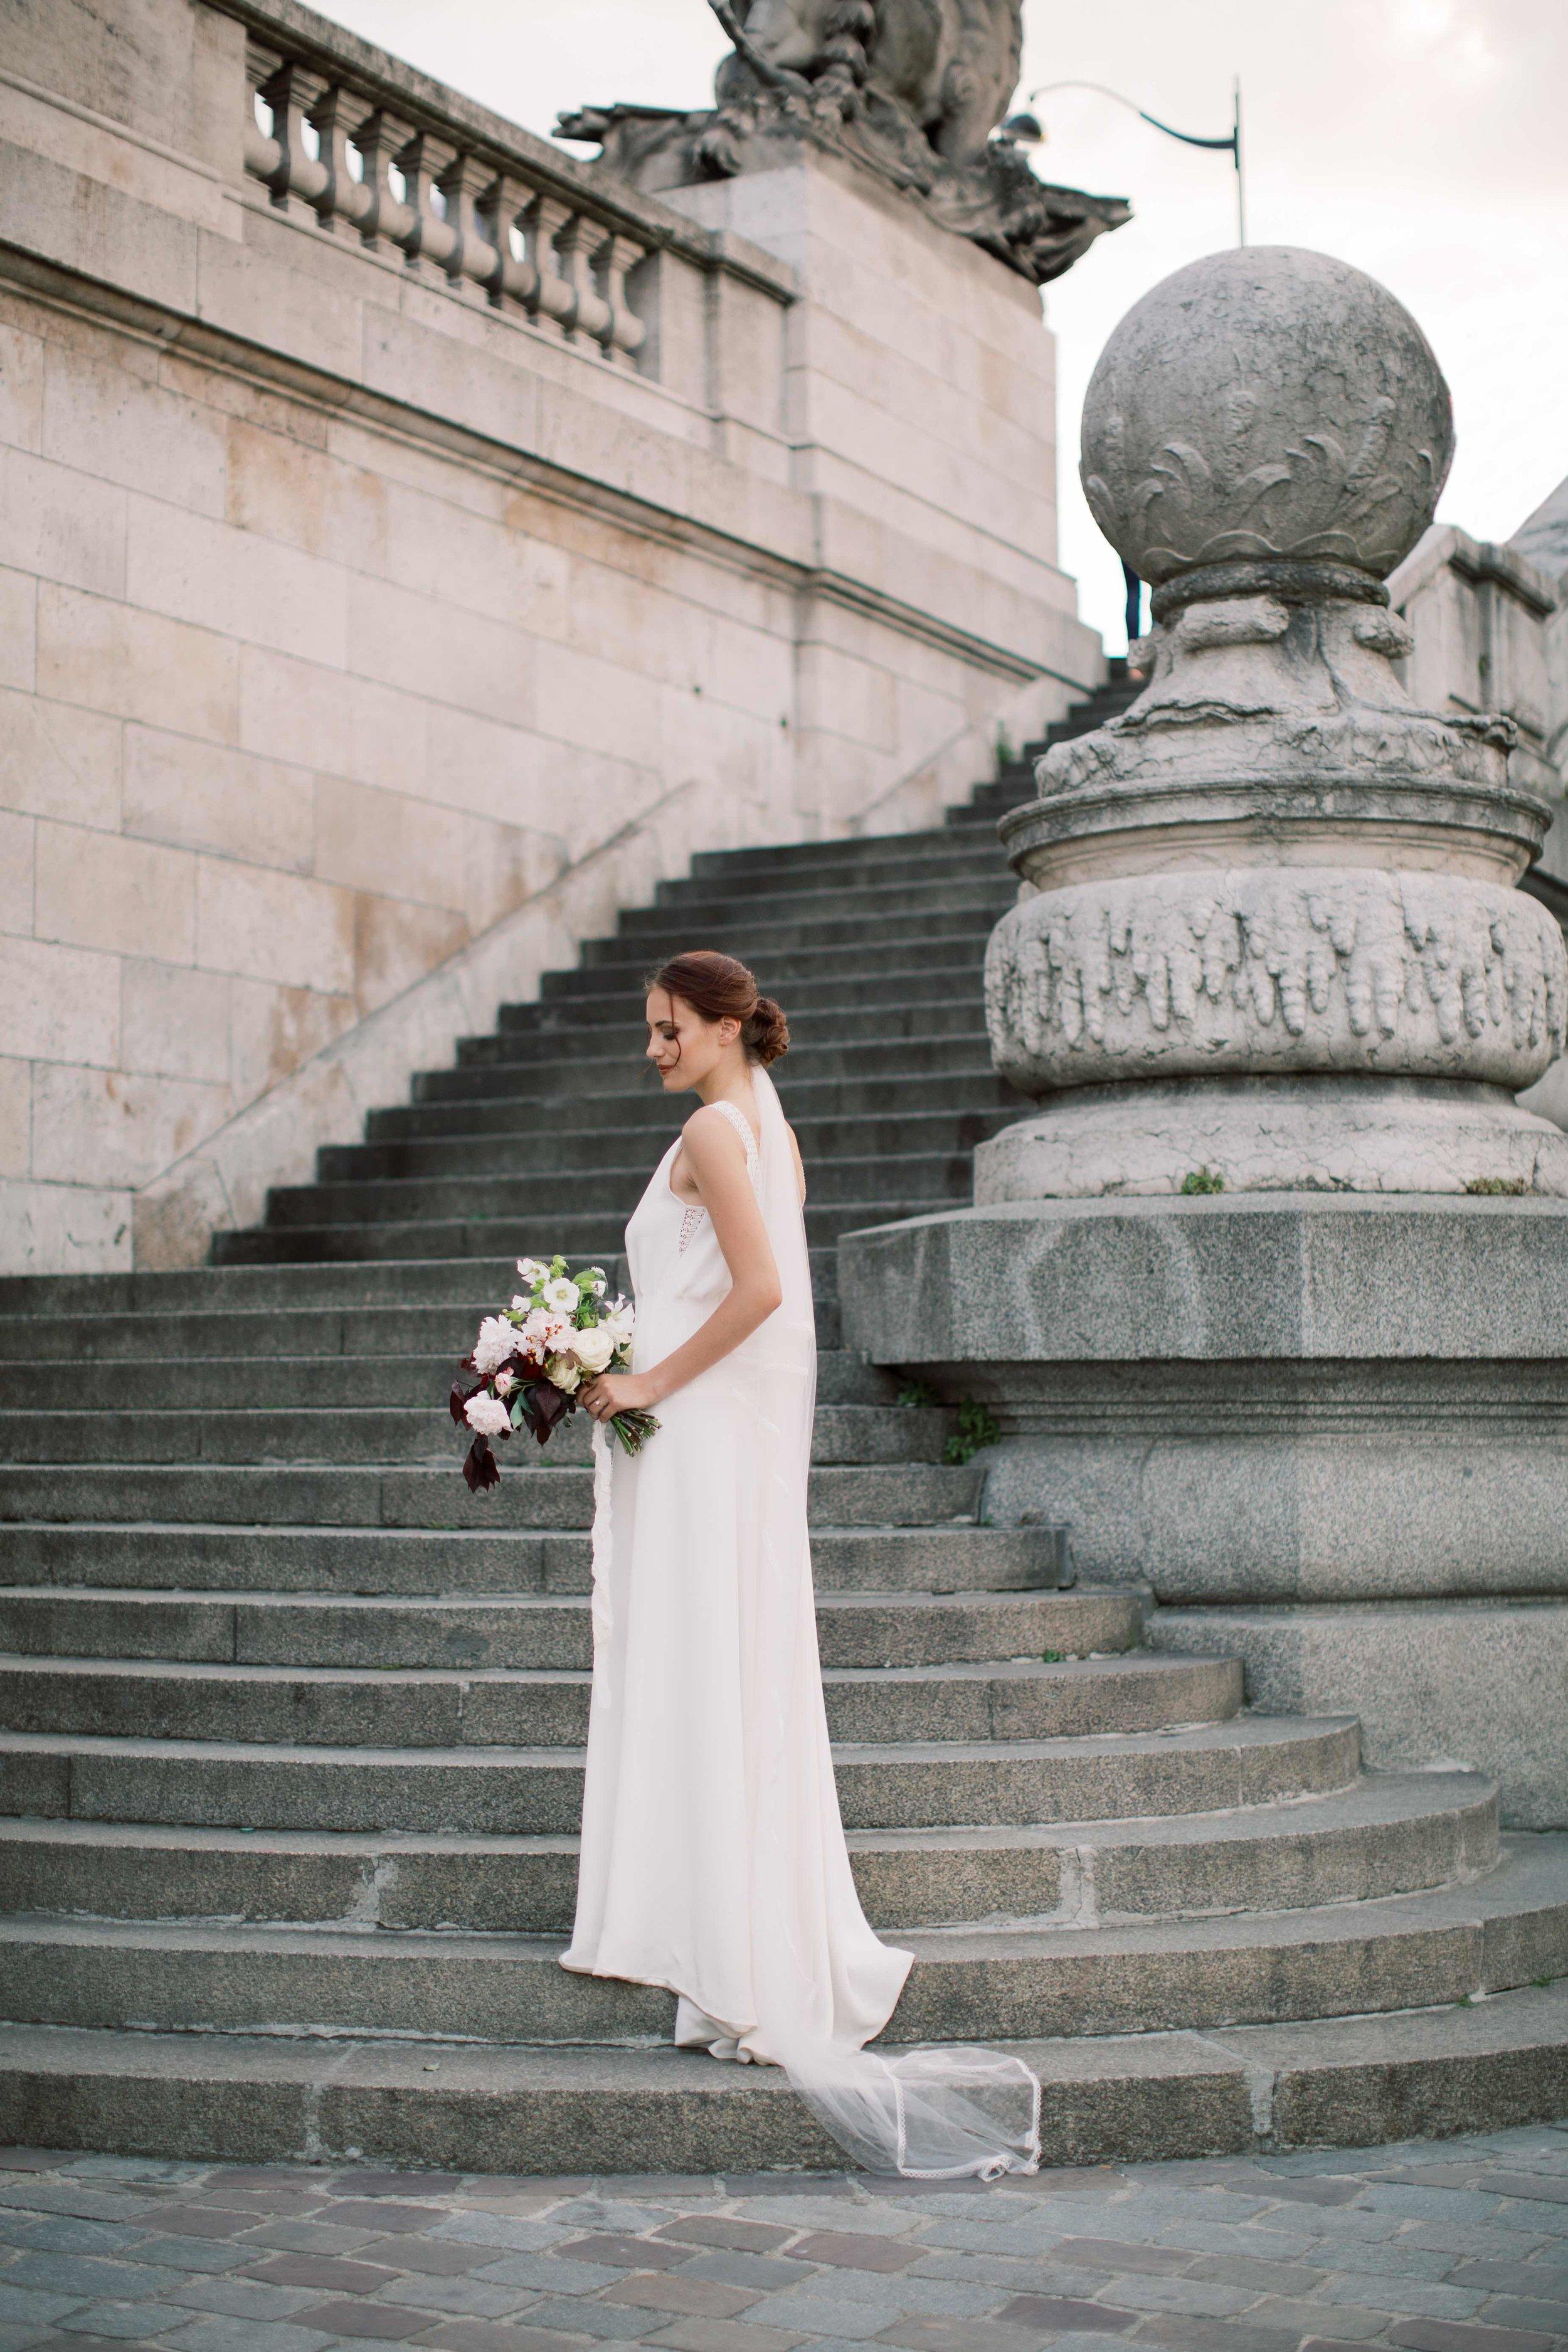 AmeliaClairePhotography_paris-1-106_2.jpeg